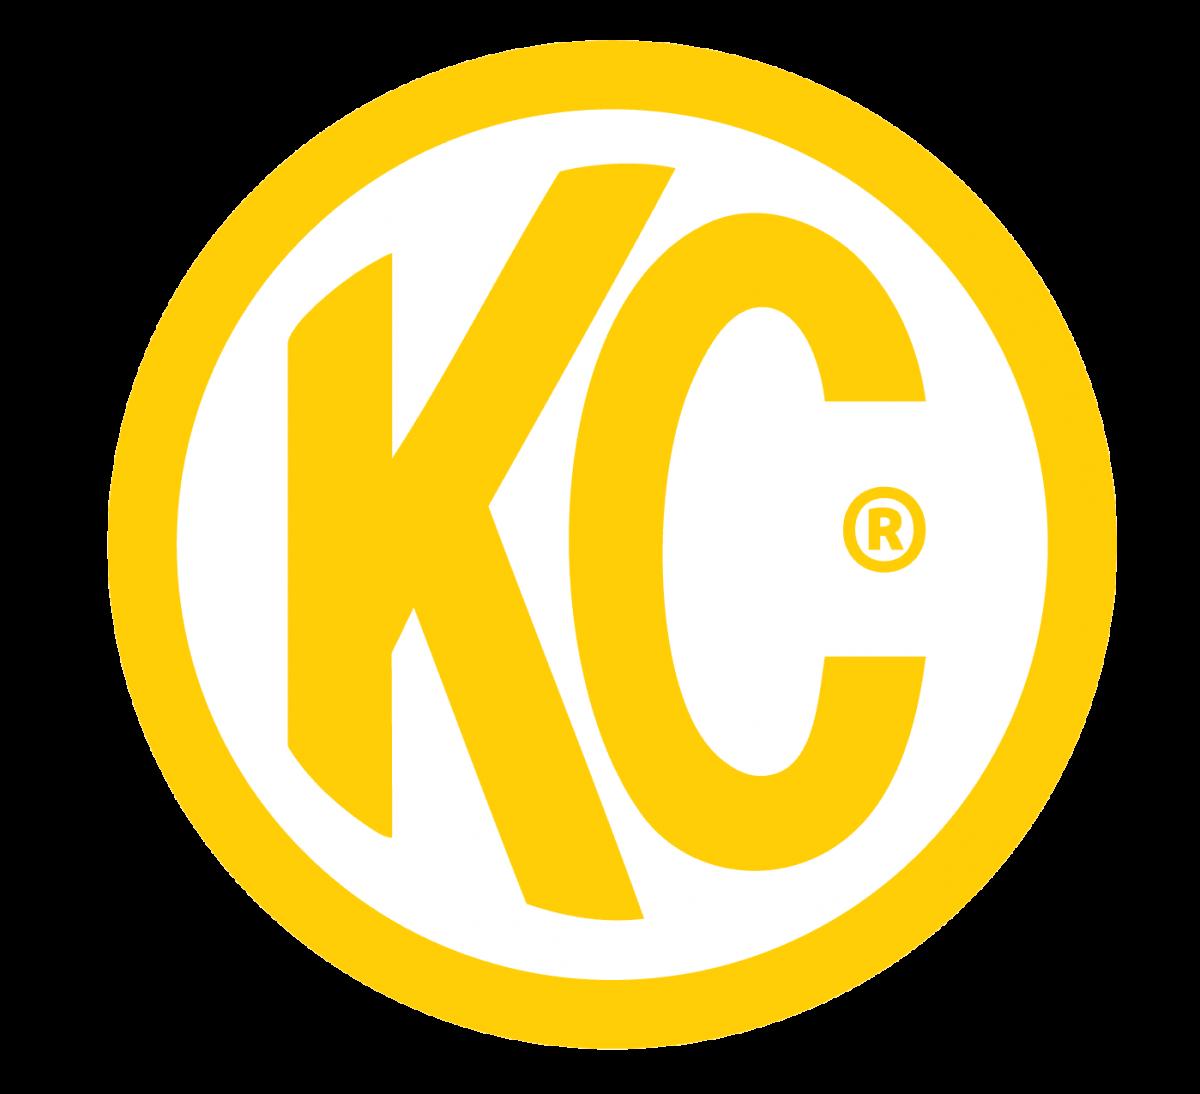 KC.fw.png